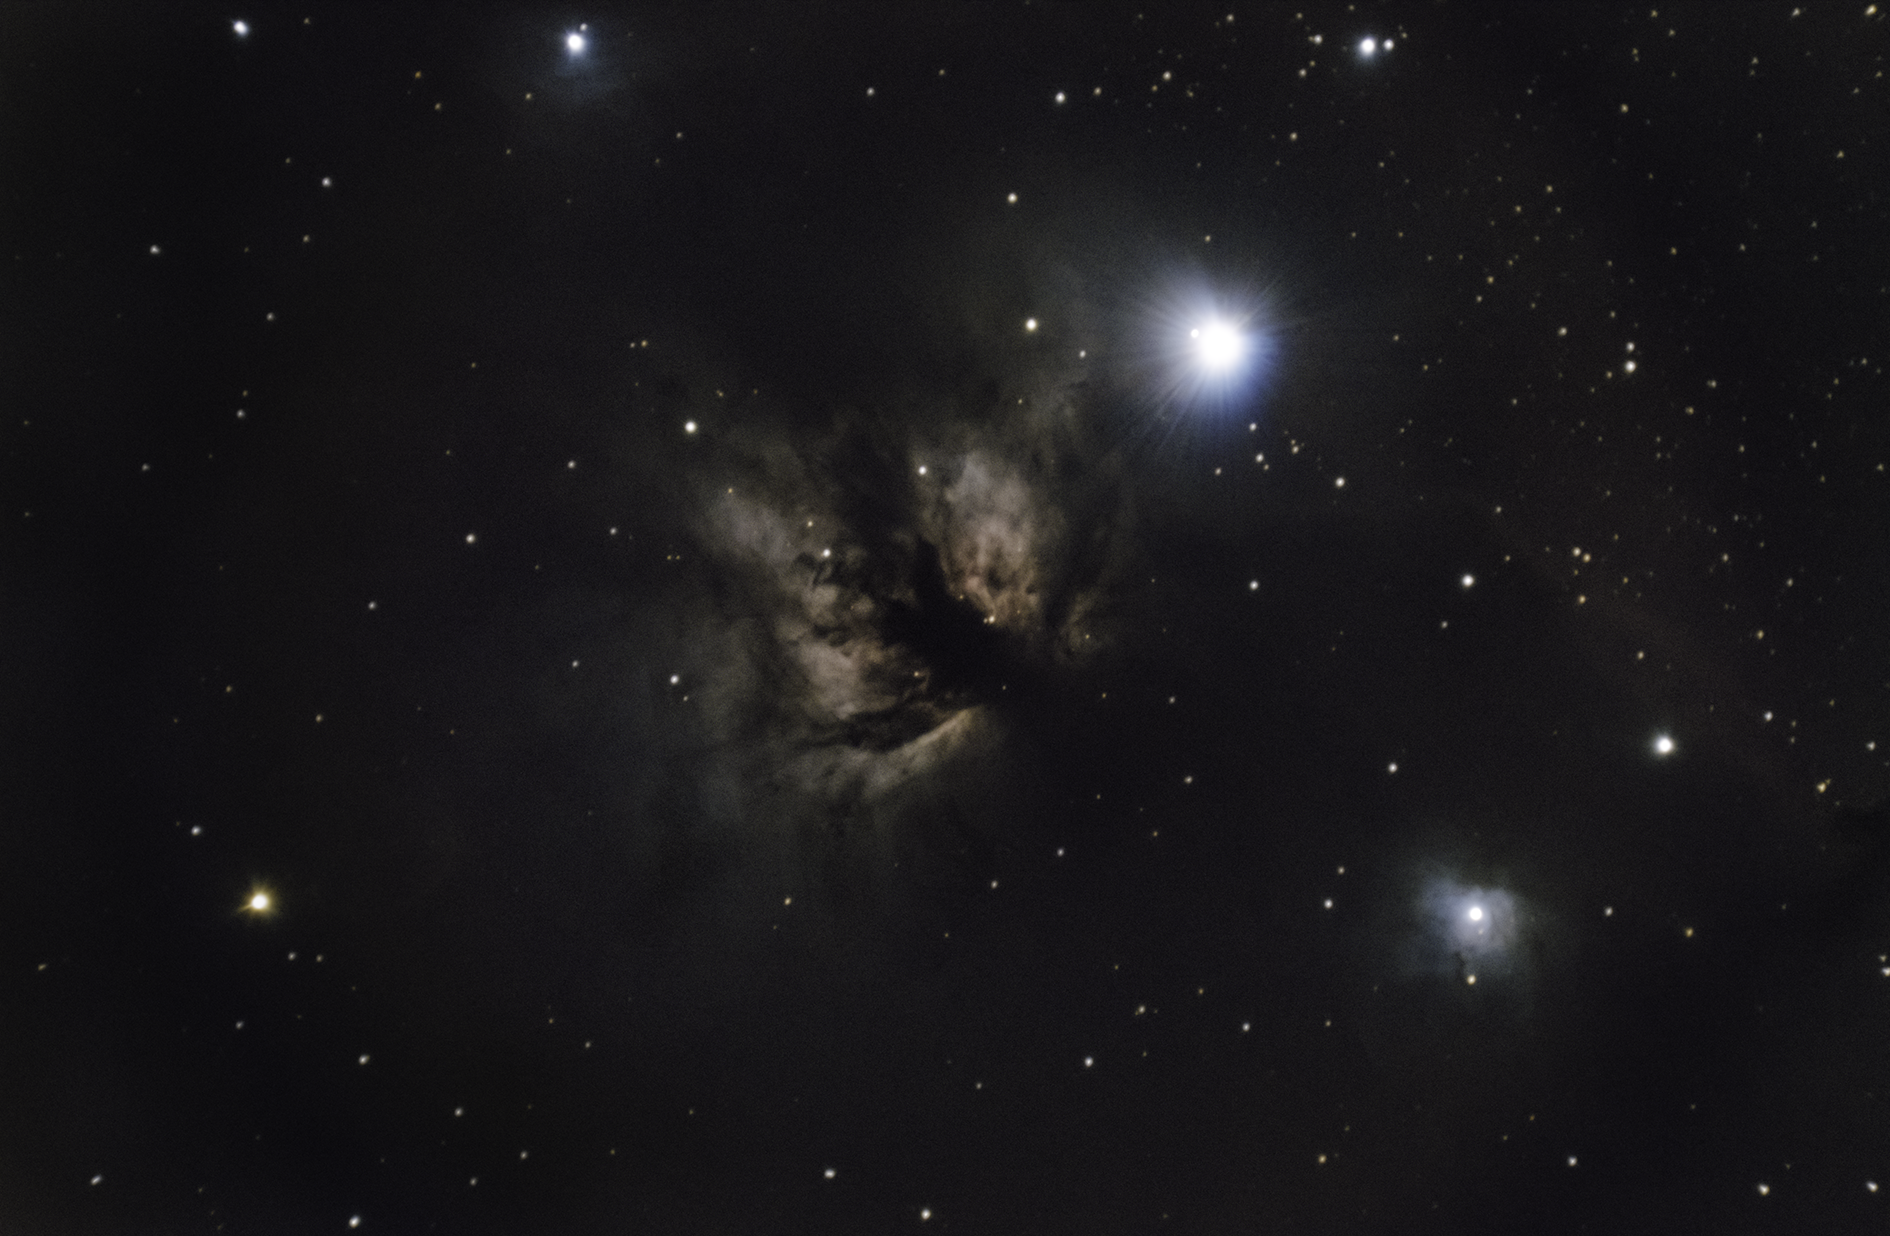 NGC_2024.png.b12a5fc6ff347b9626c721d42232421c.png